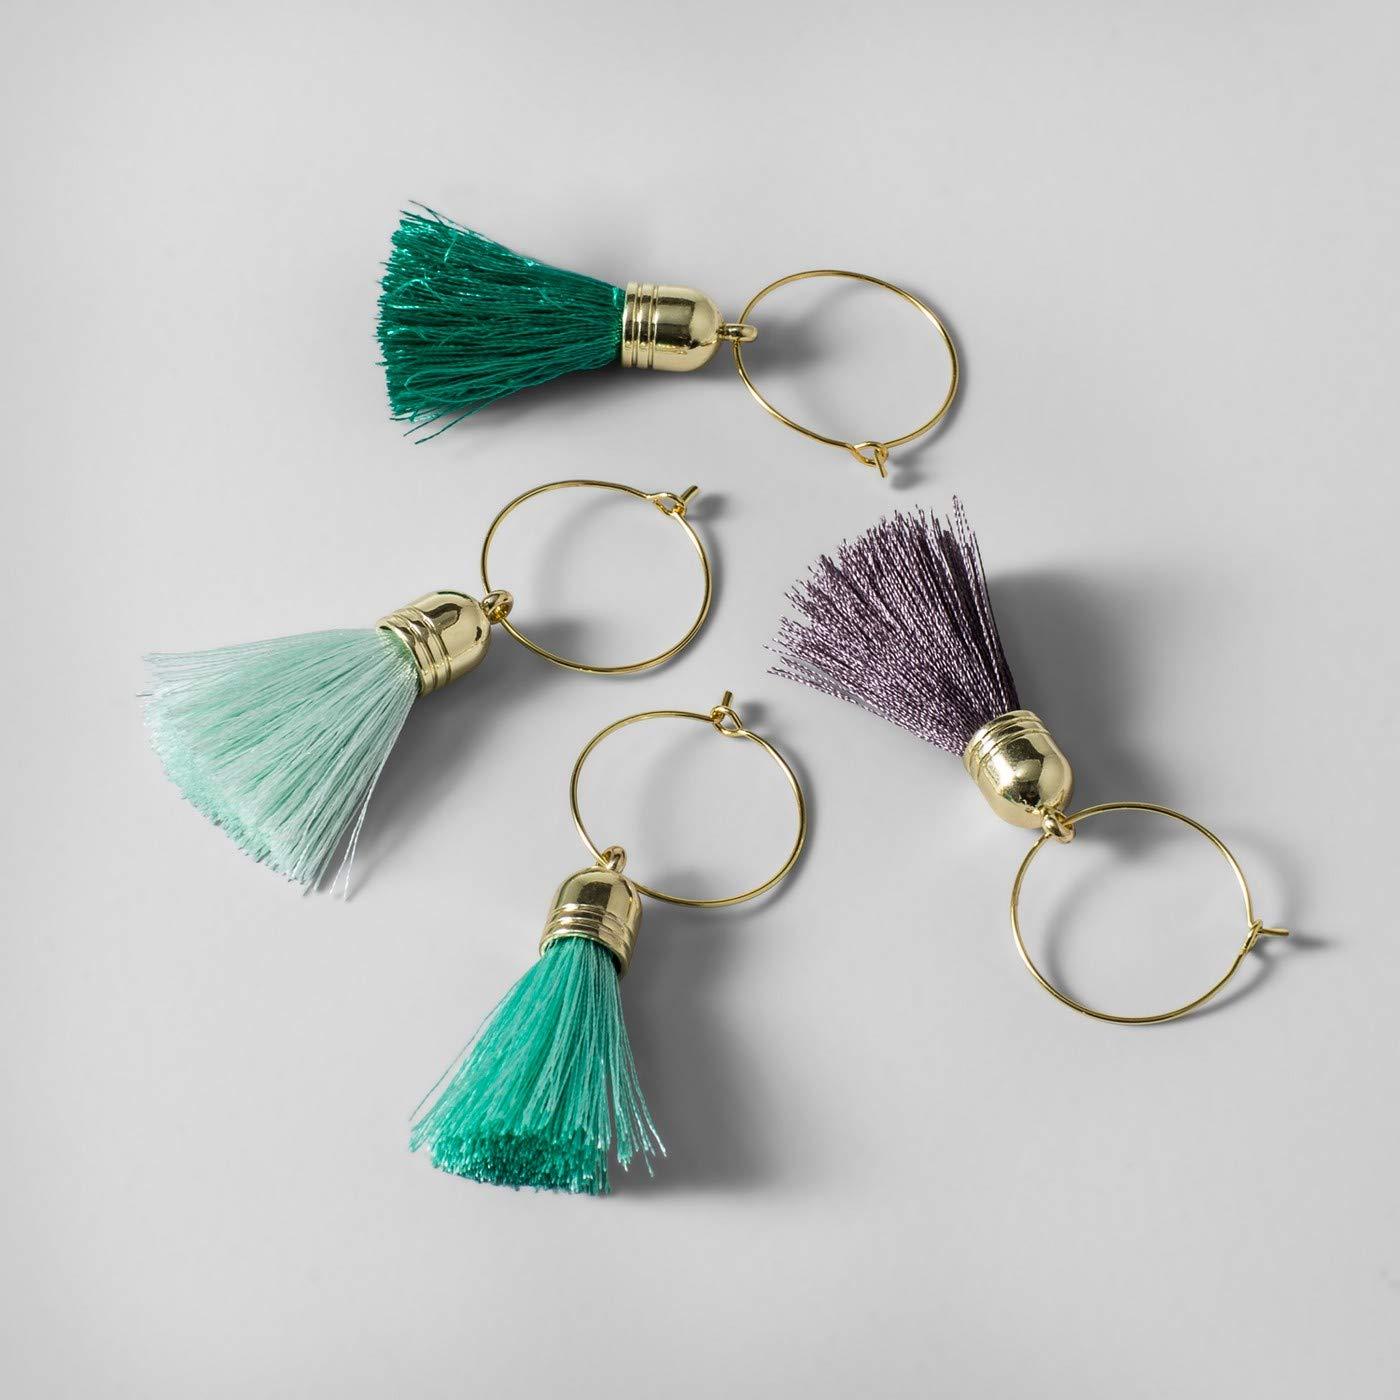 Wine Tassel Charm Accessories Green/Blue/Purple Set of 4 by Opalhouse